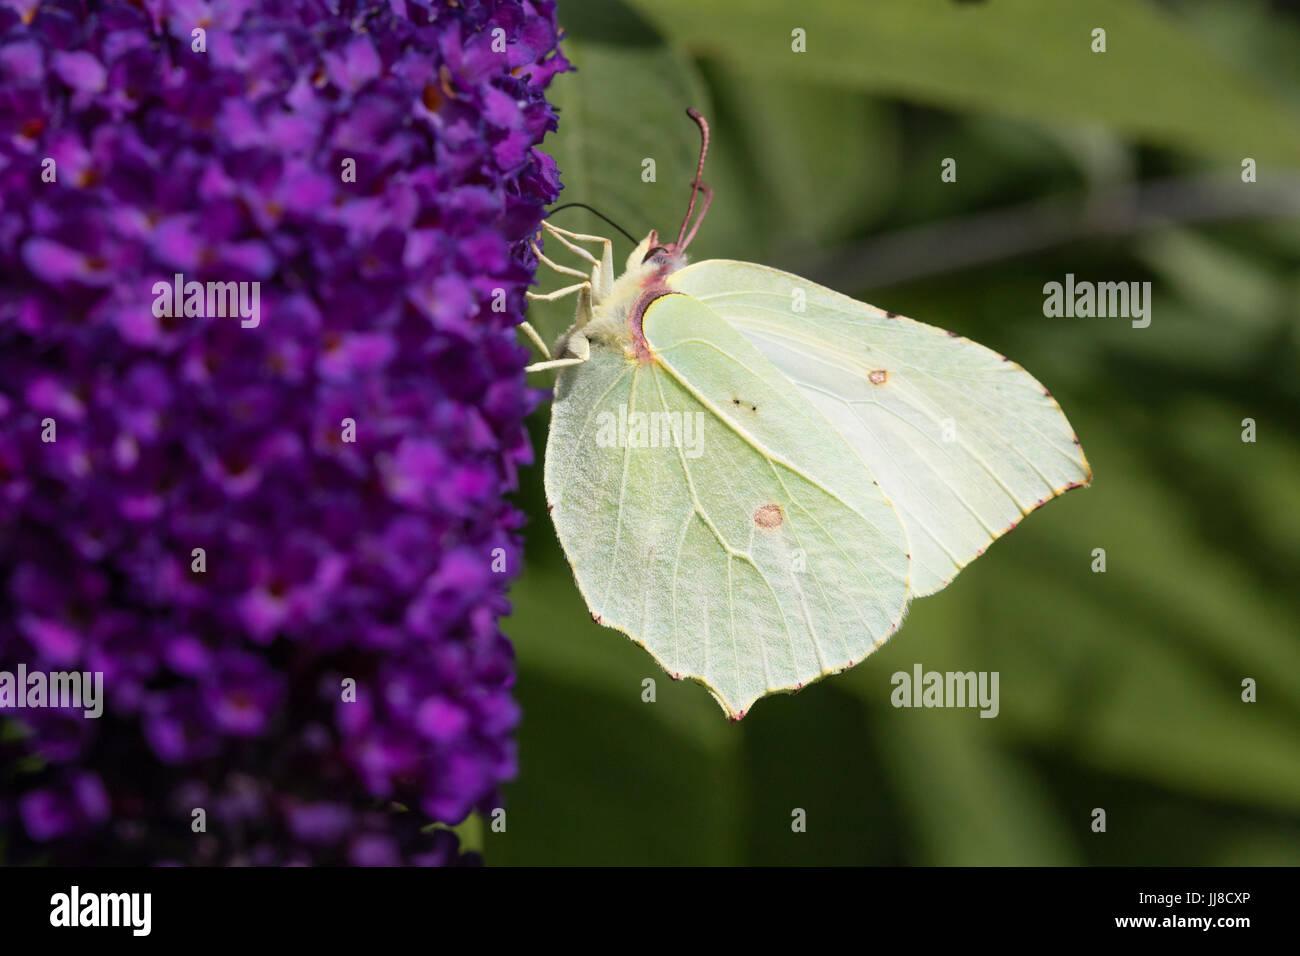 Femmina di Brimstone butterfly, Gonepteryx rhamni, alimentando il fiore di panicle Buddleja davidii 'Dalesatura Immagini Stock